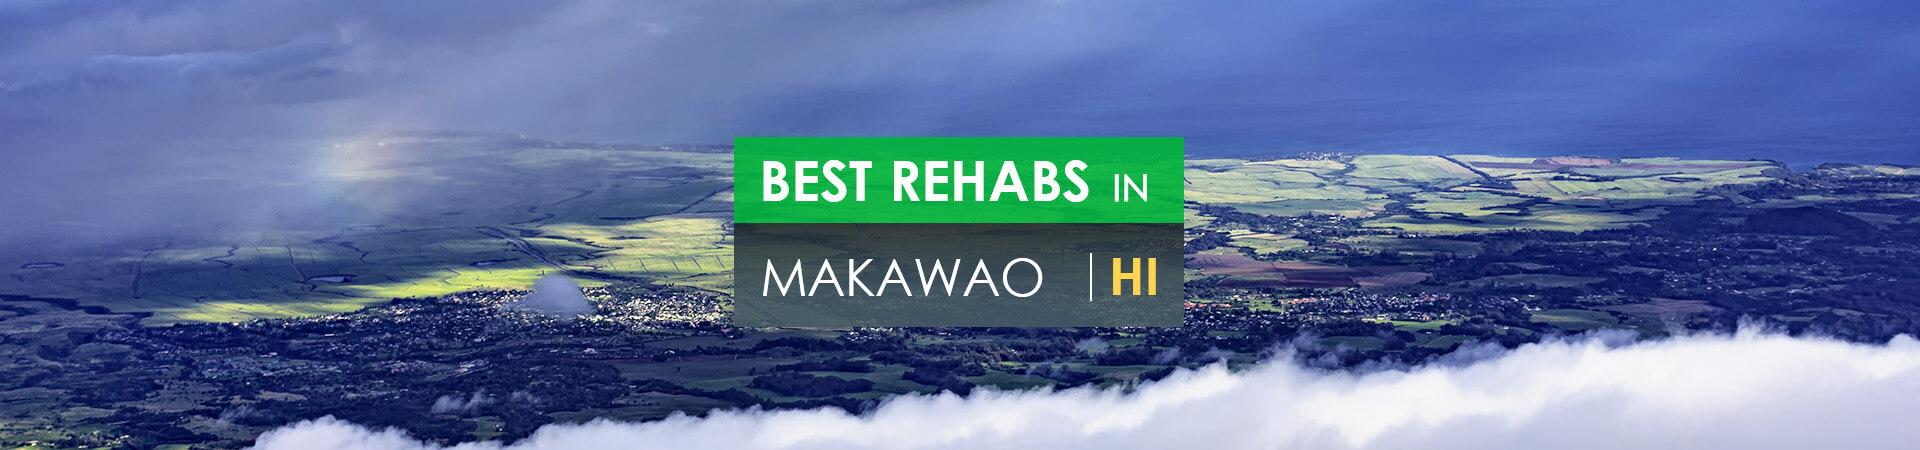 Best rehabs in Makawao, HI